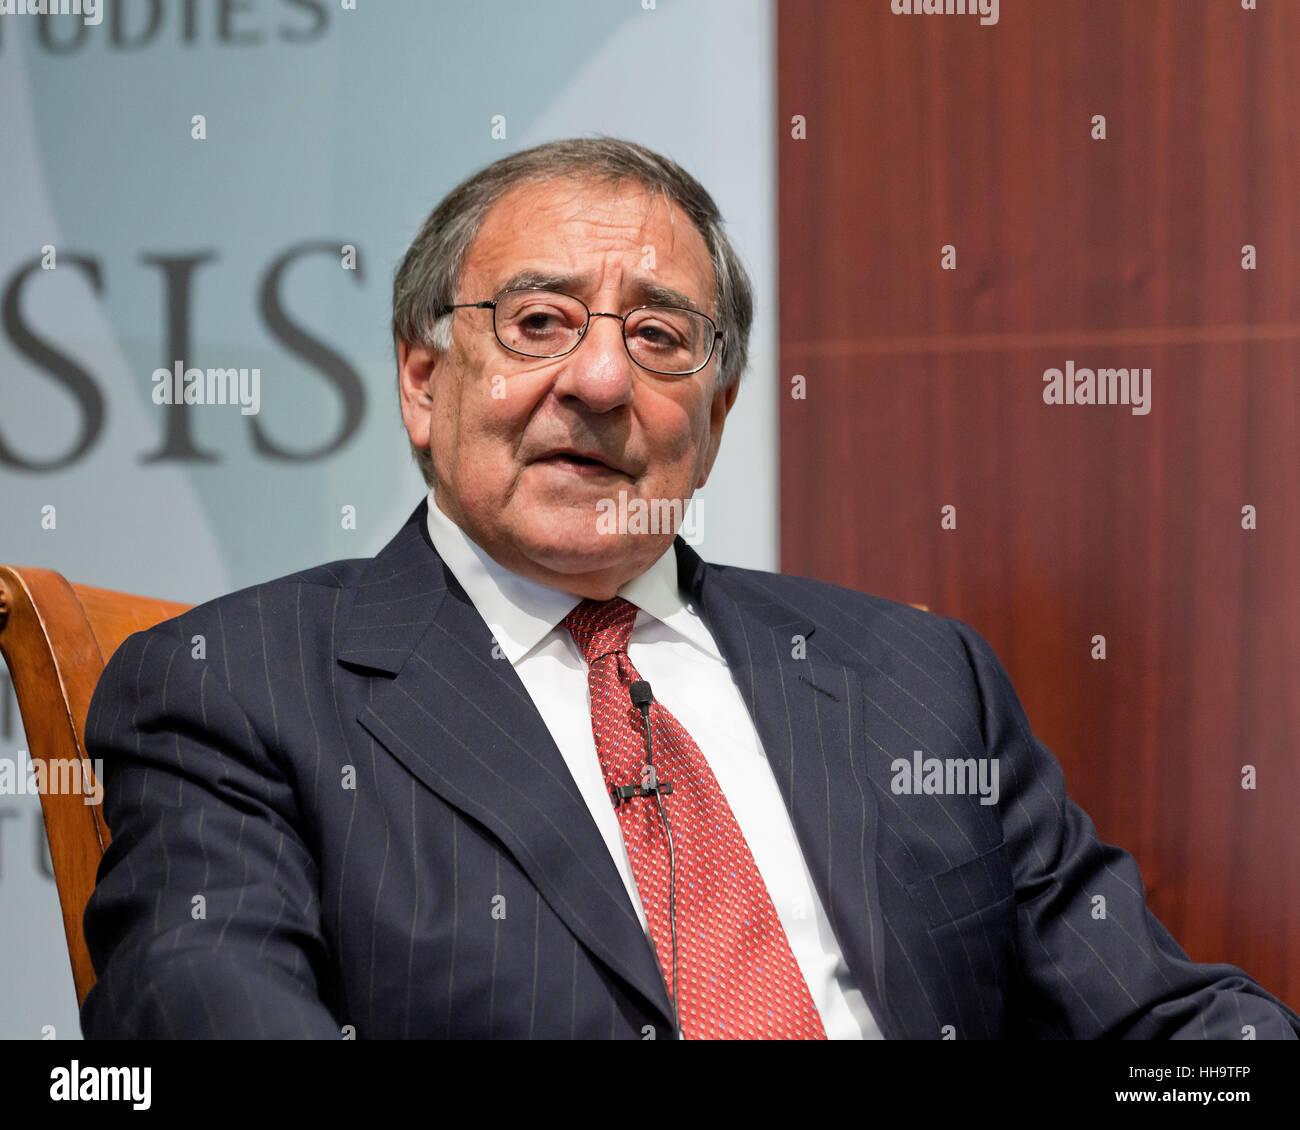 Leon Panetta, former CIA director and Defense secretary of the USA - Stock Image